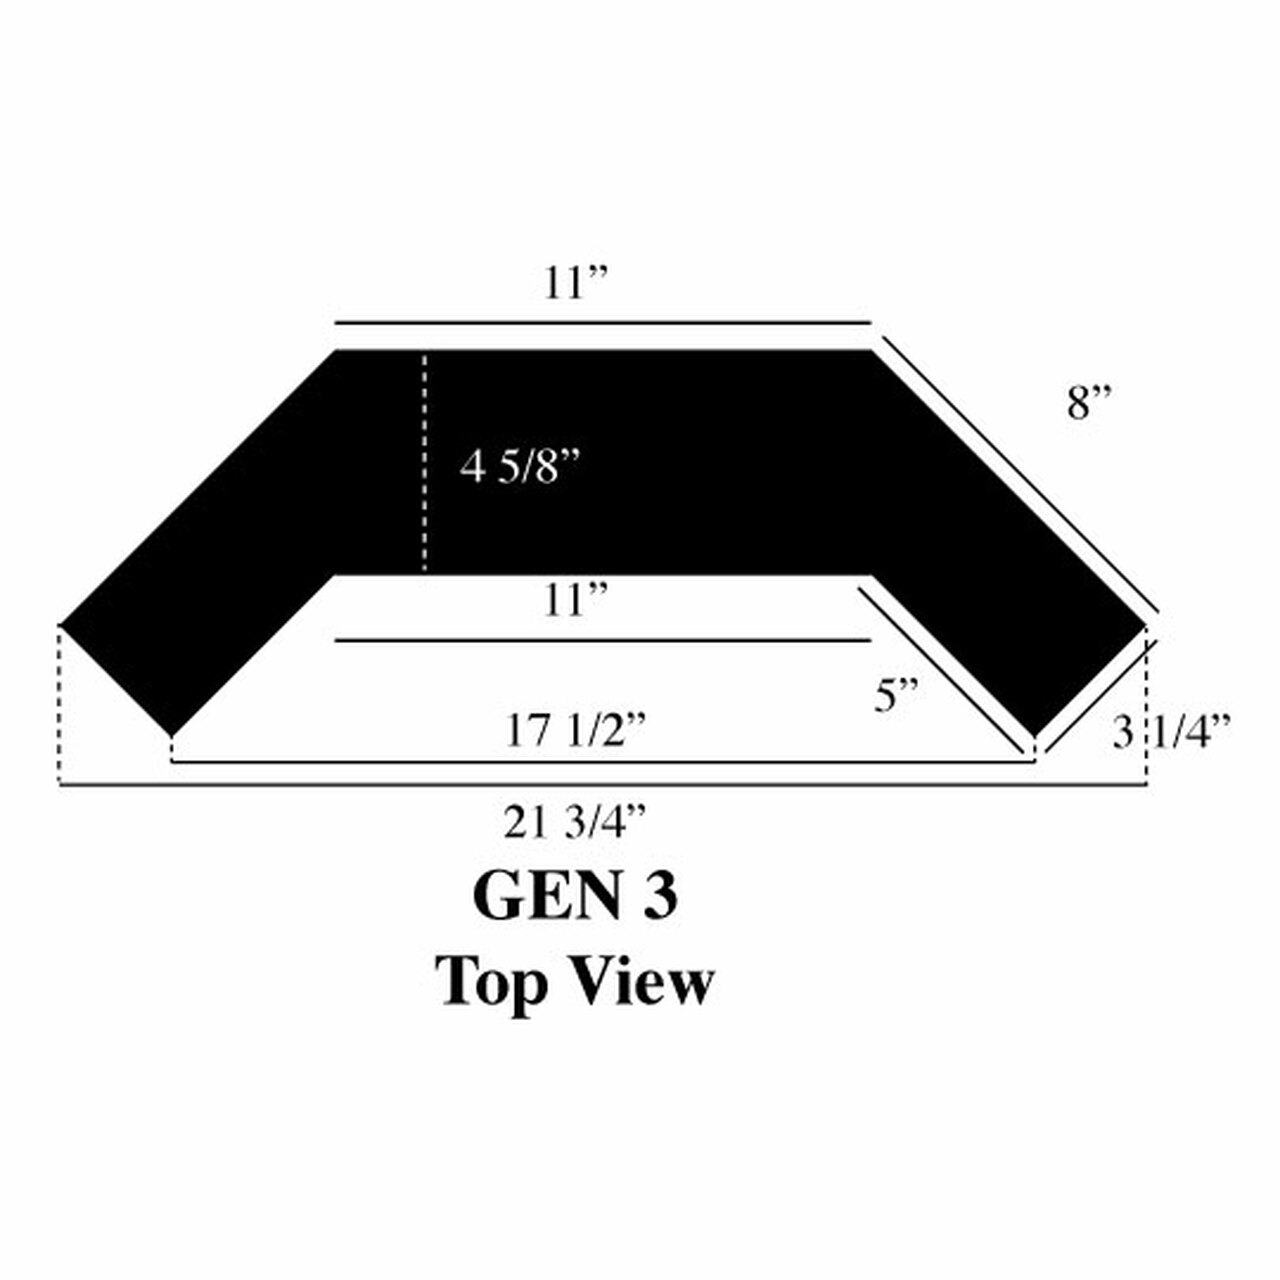 Gen 3 boat light dimensions